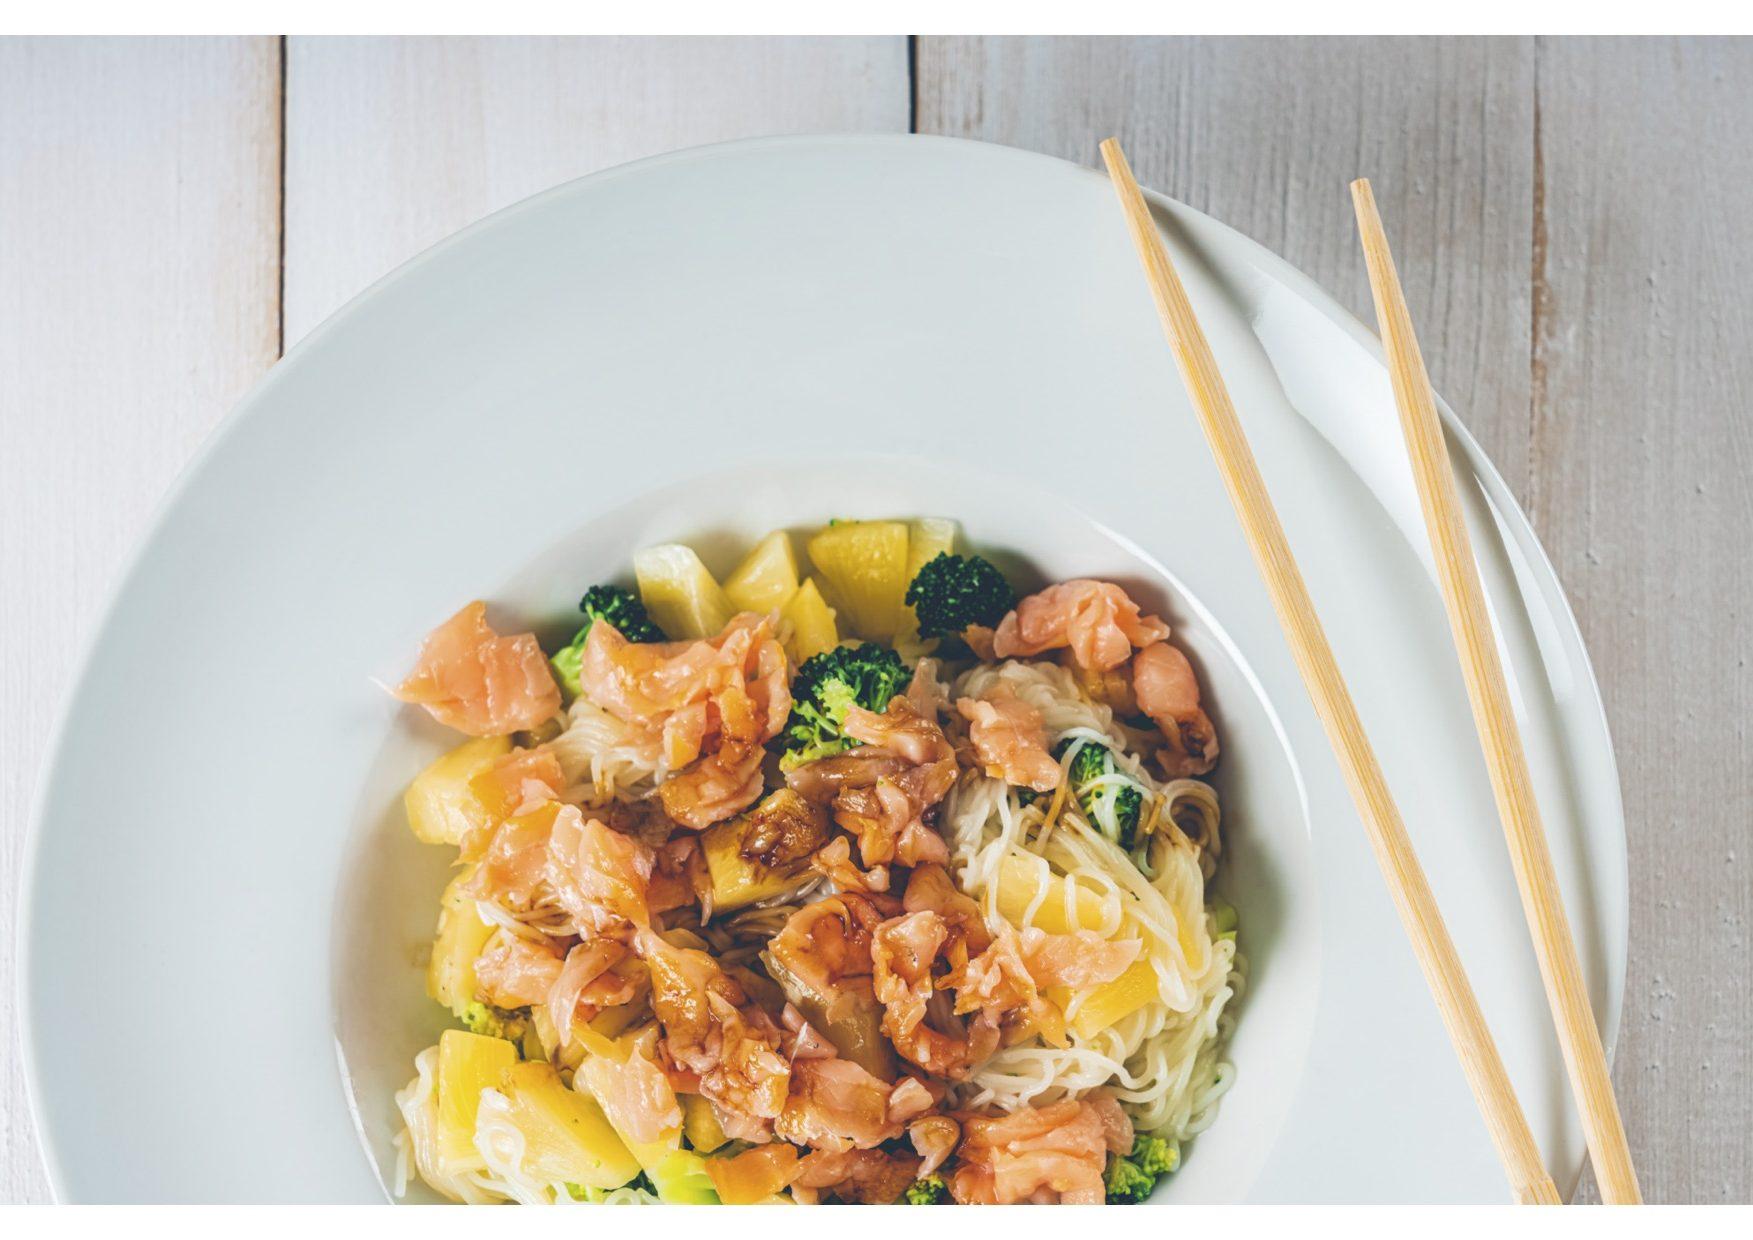 Spaghetti With Poached Egg, Teriyaki Grilled Salmon, Black Garlic Peanut Chilli Rayu by Chef Kwanghi Chan